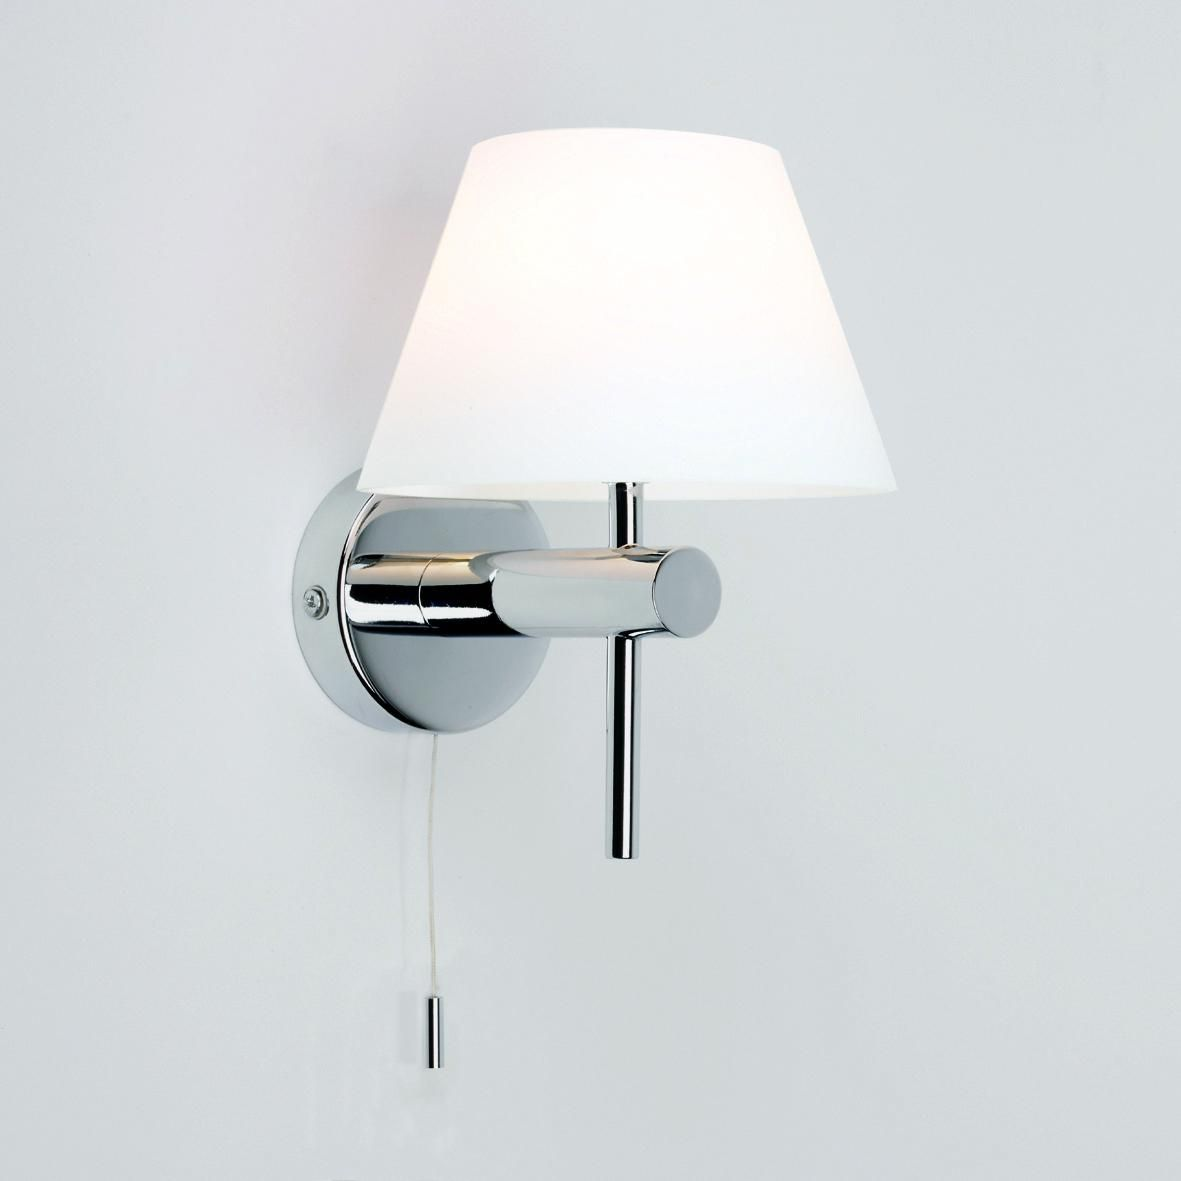 bathroom wall light with coolie shade pullcord bathroom en